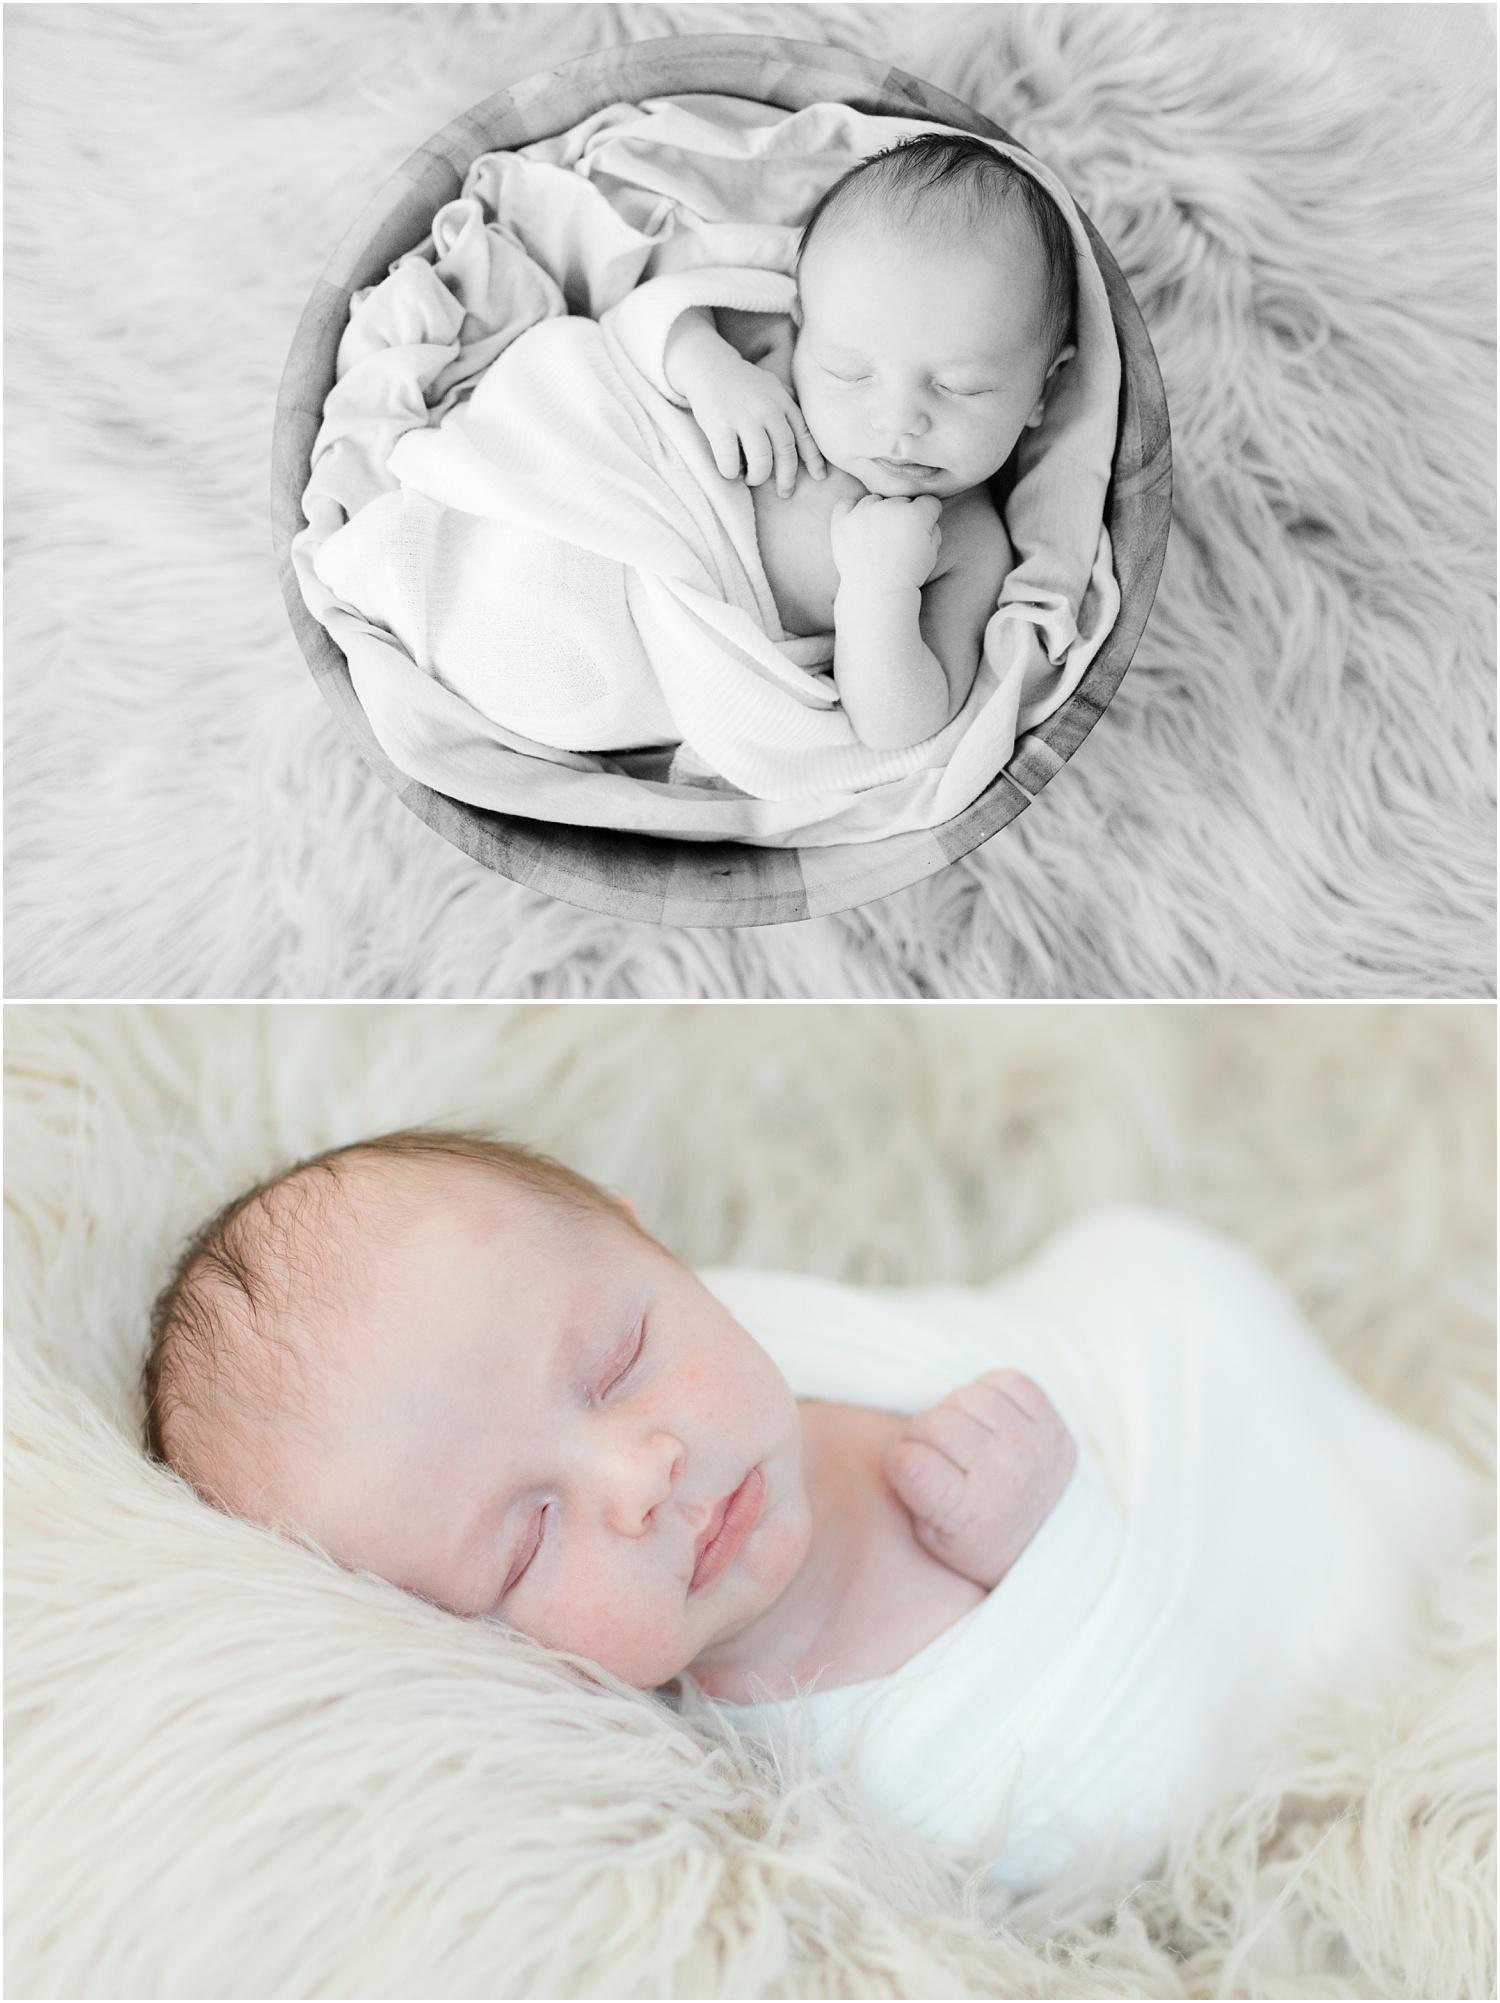 Simple natural newborn photos of baby boy.